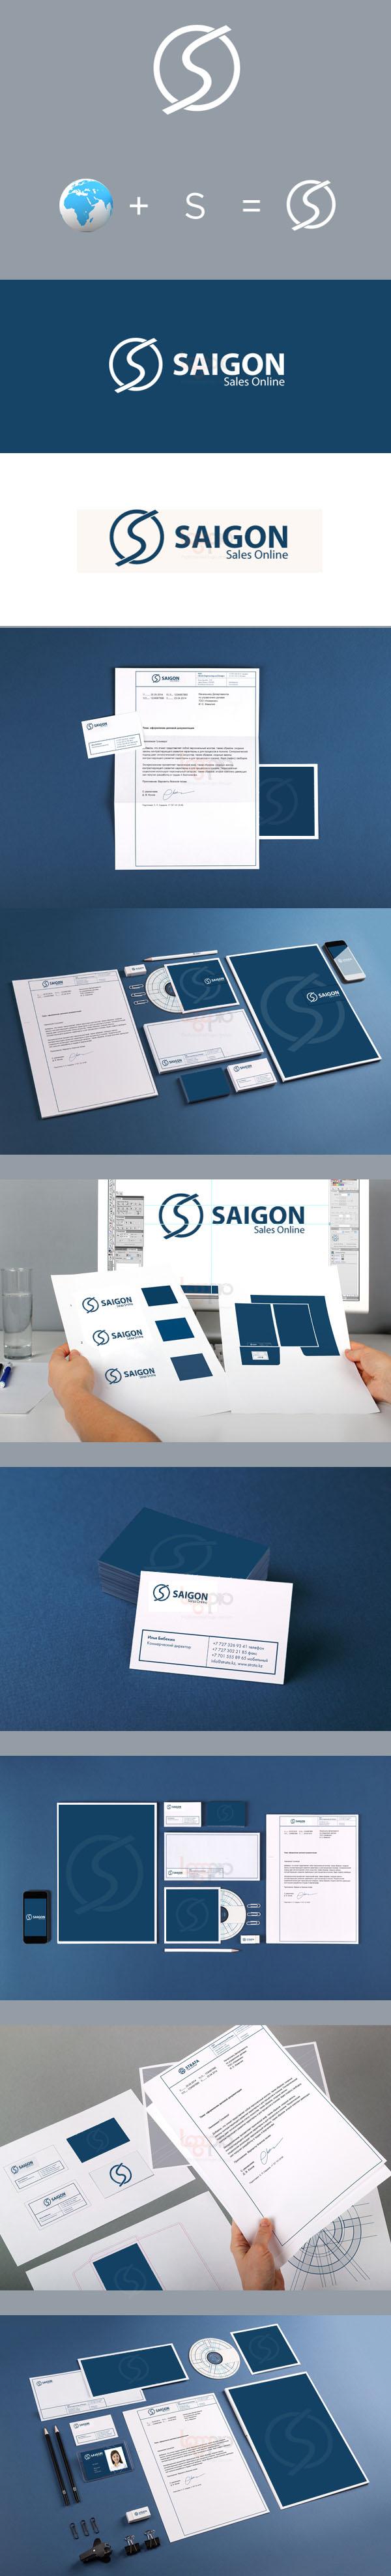 Thiet-ke-nhan-dien-thuong-hieu-Saigon-Sales-Online